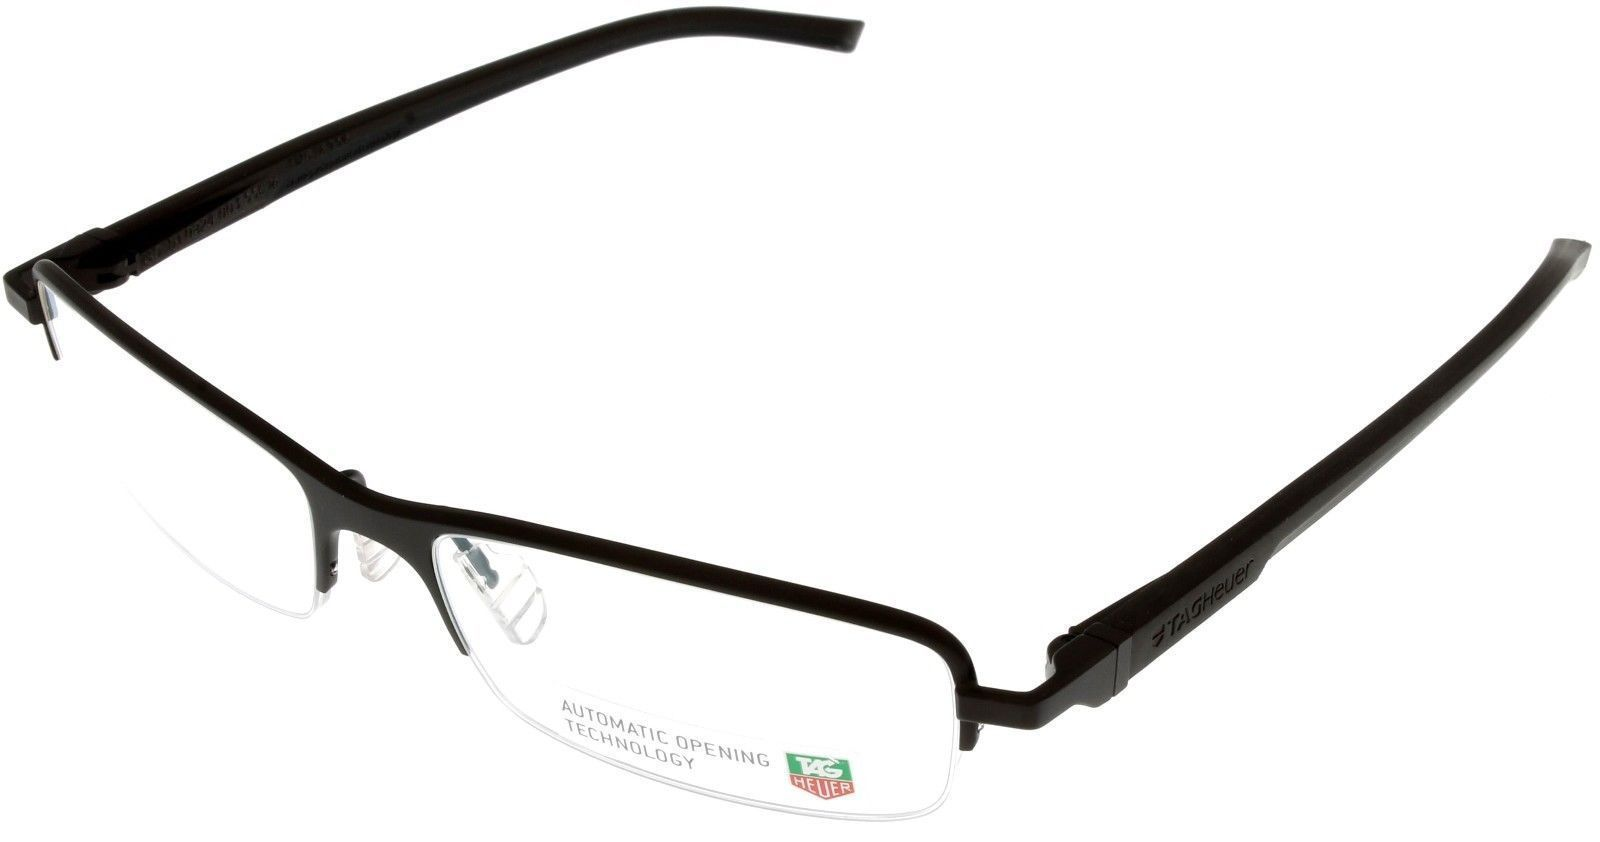 e85e95fcba1 Tag Heuer Eyeglasses Frame Unisex Chocolate Automatic Half Rimless TH0824  003 -  216.81